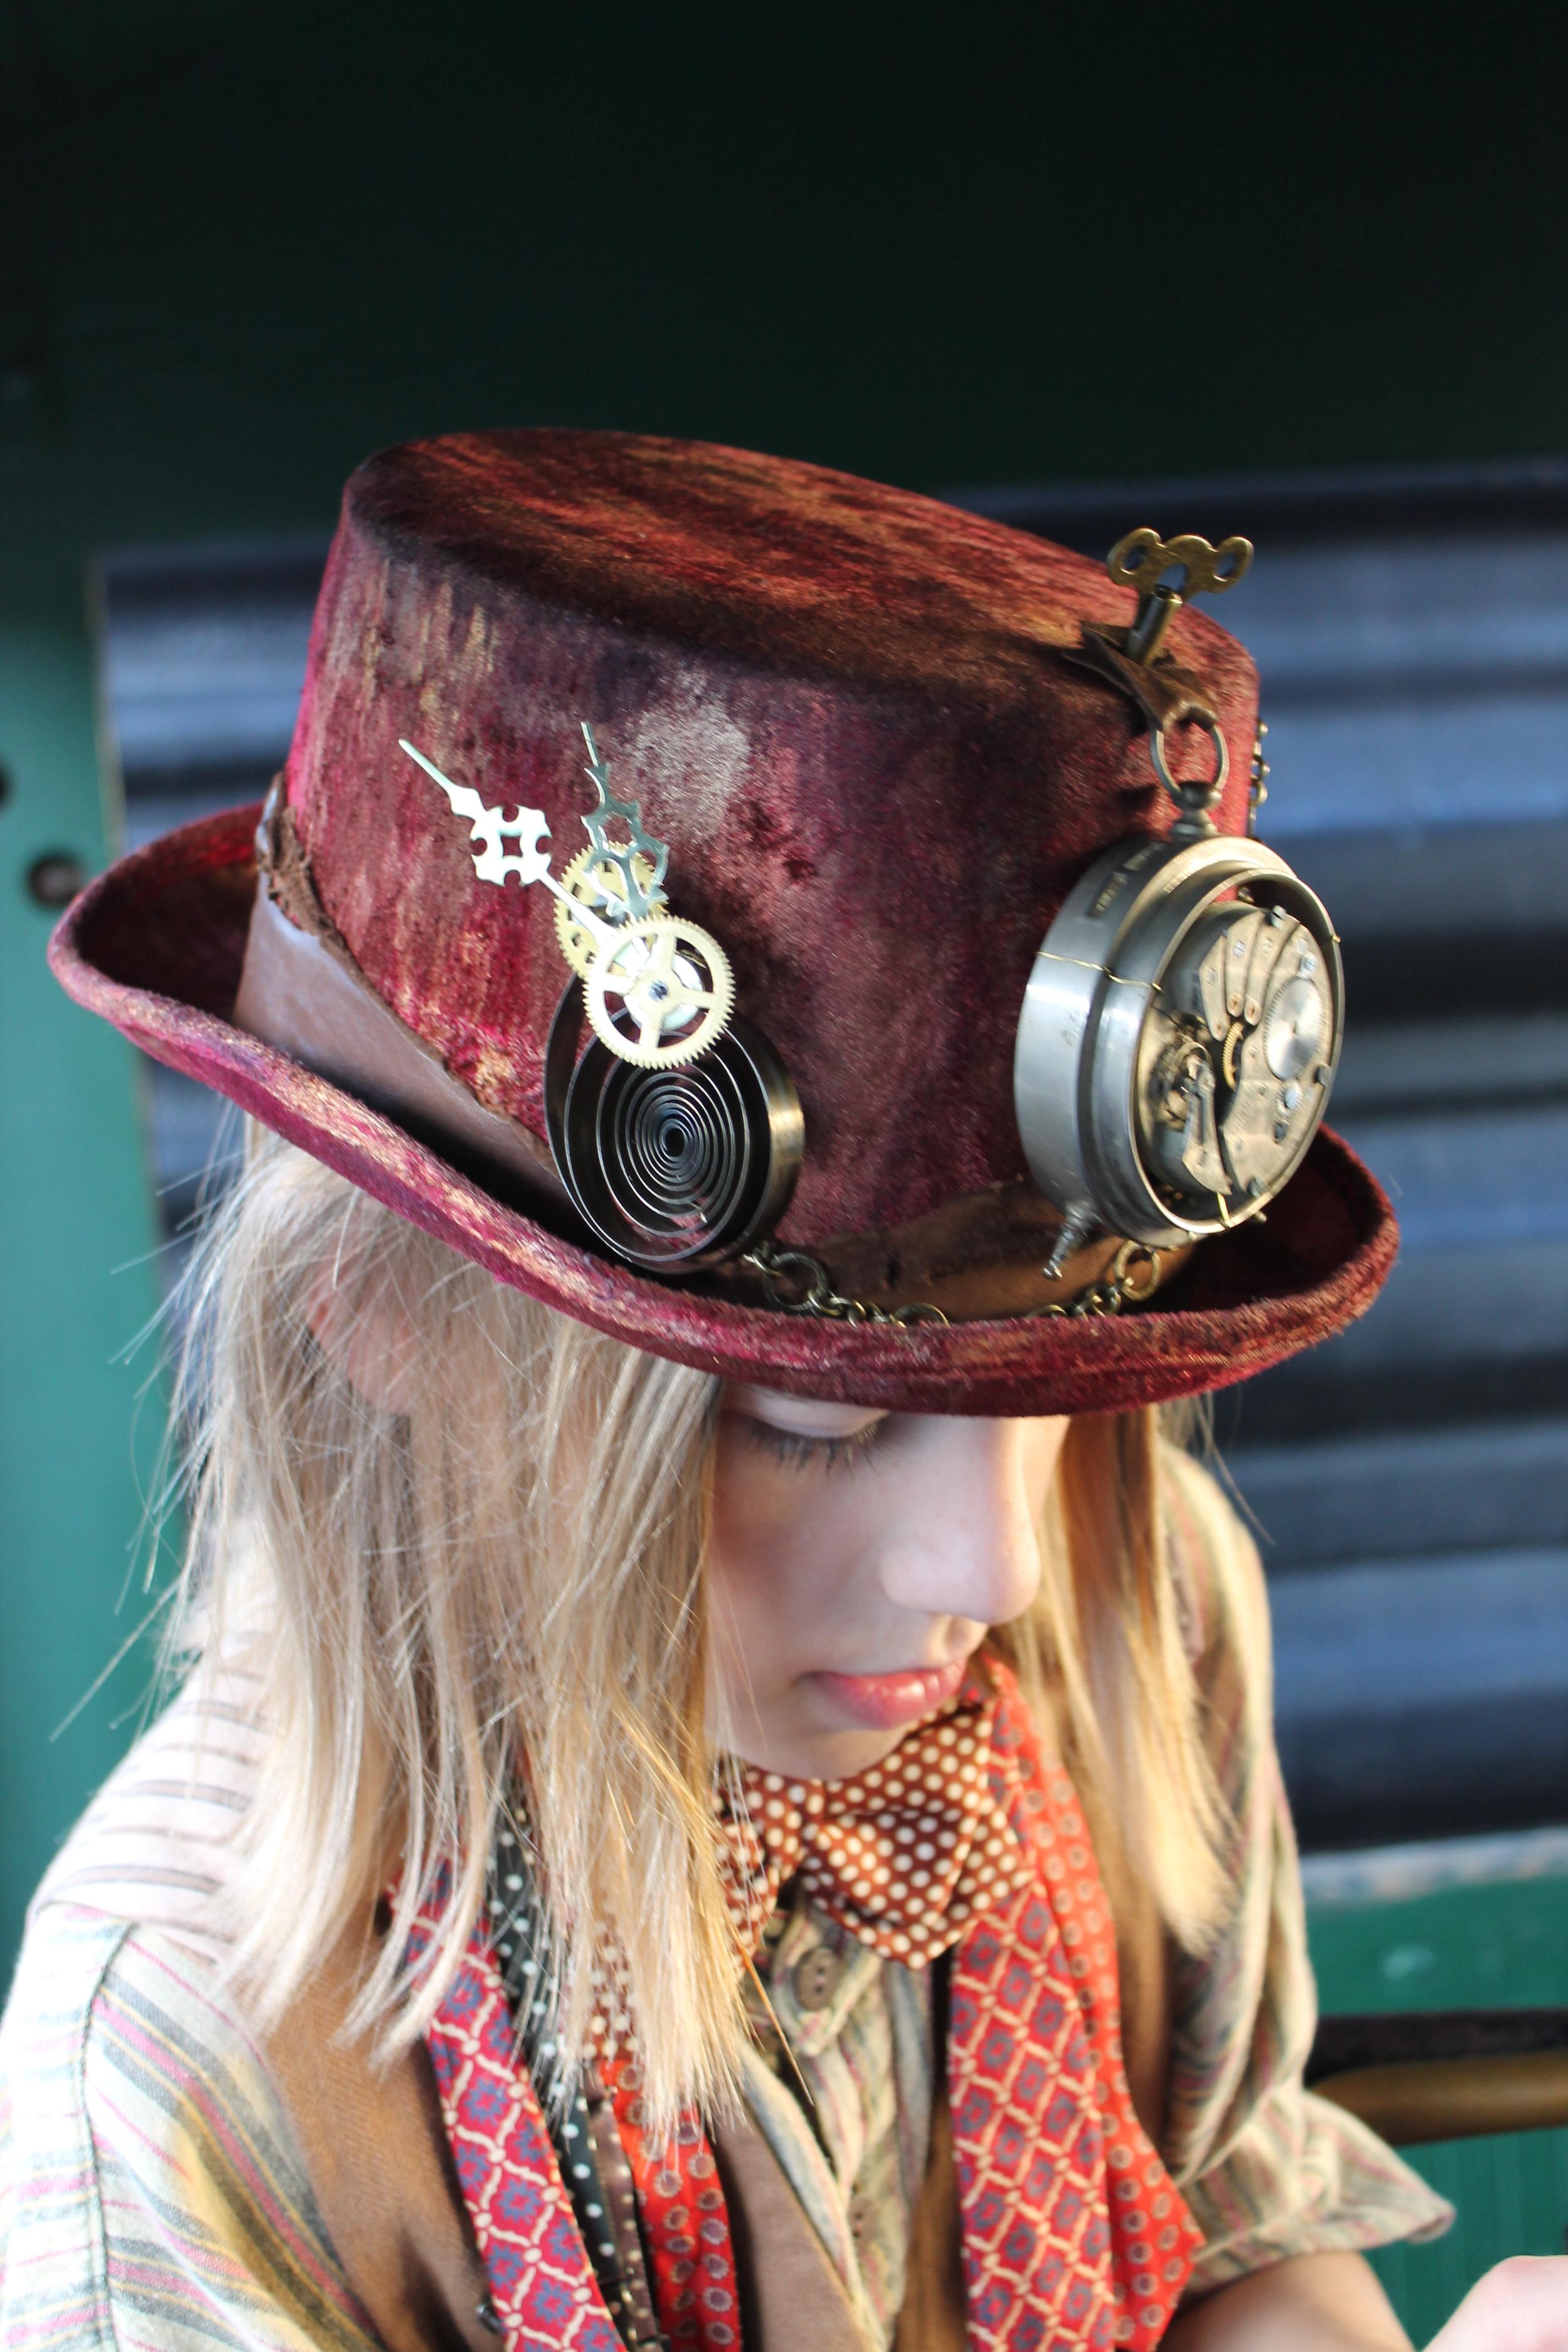 Hand-painted Velvet Clockwork Top Hat